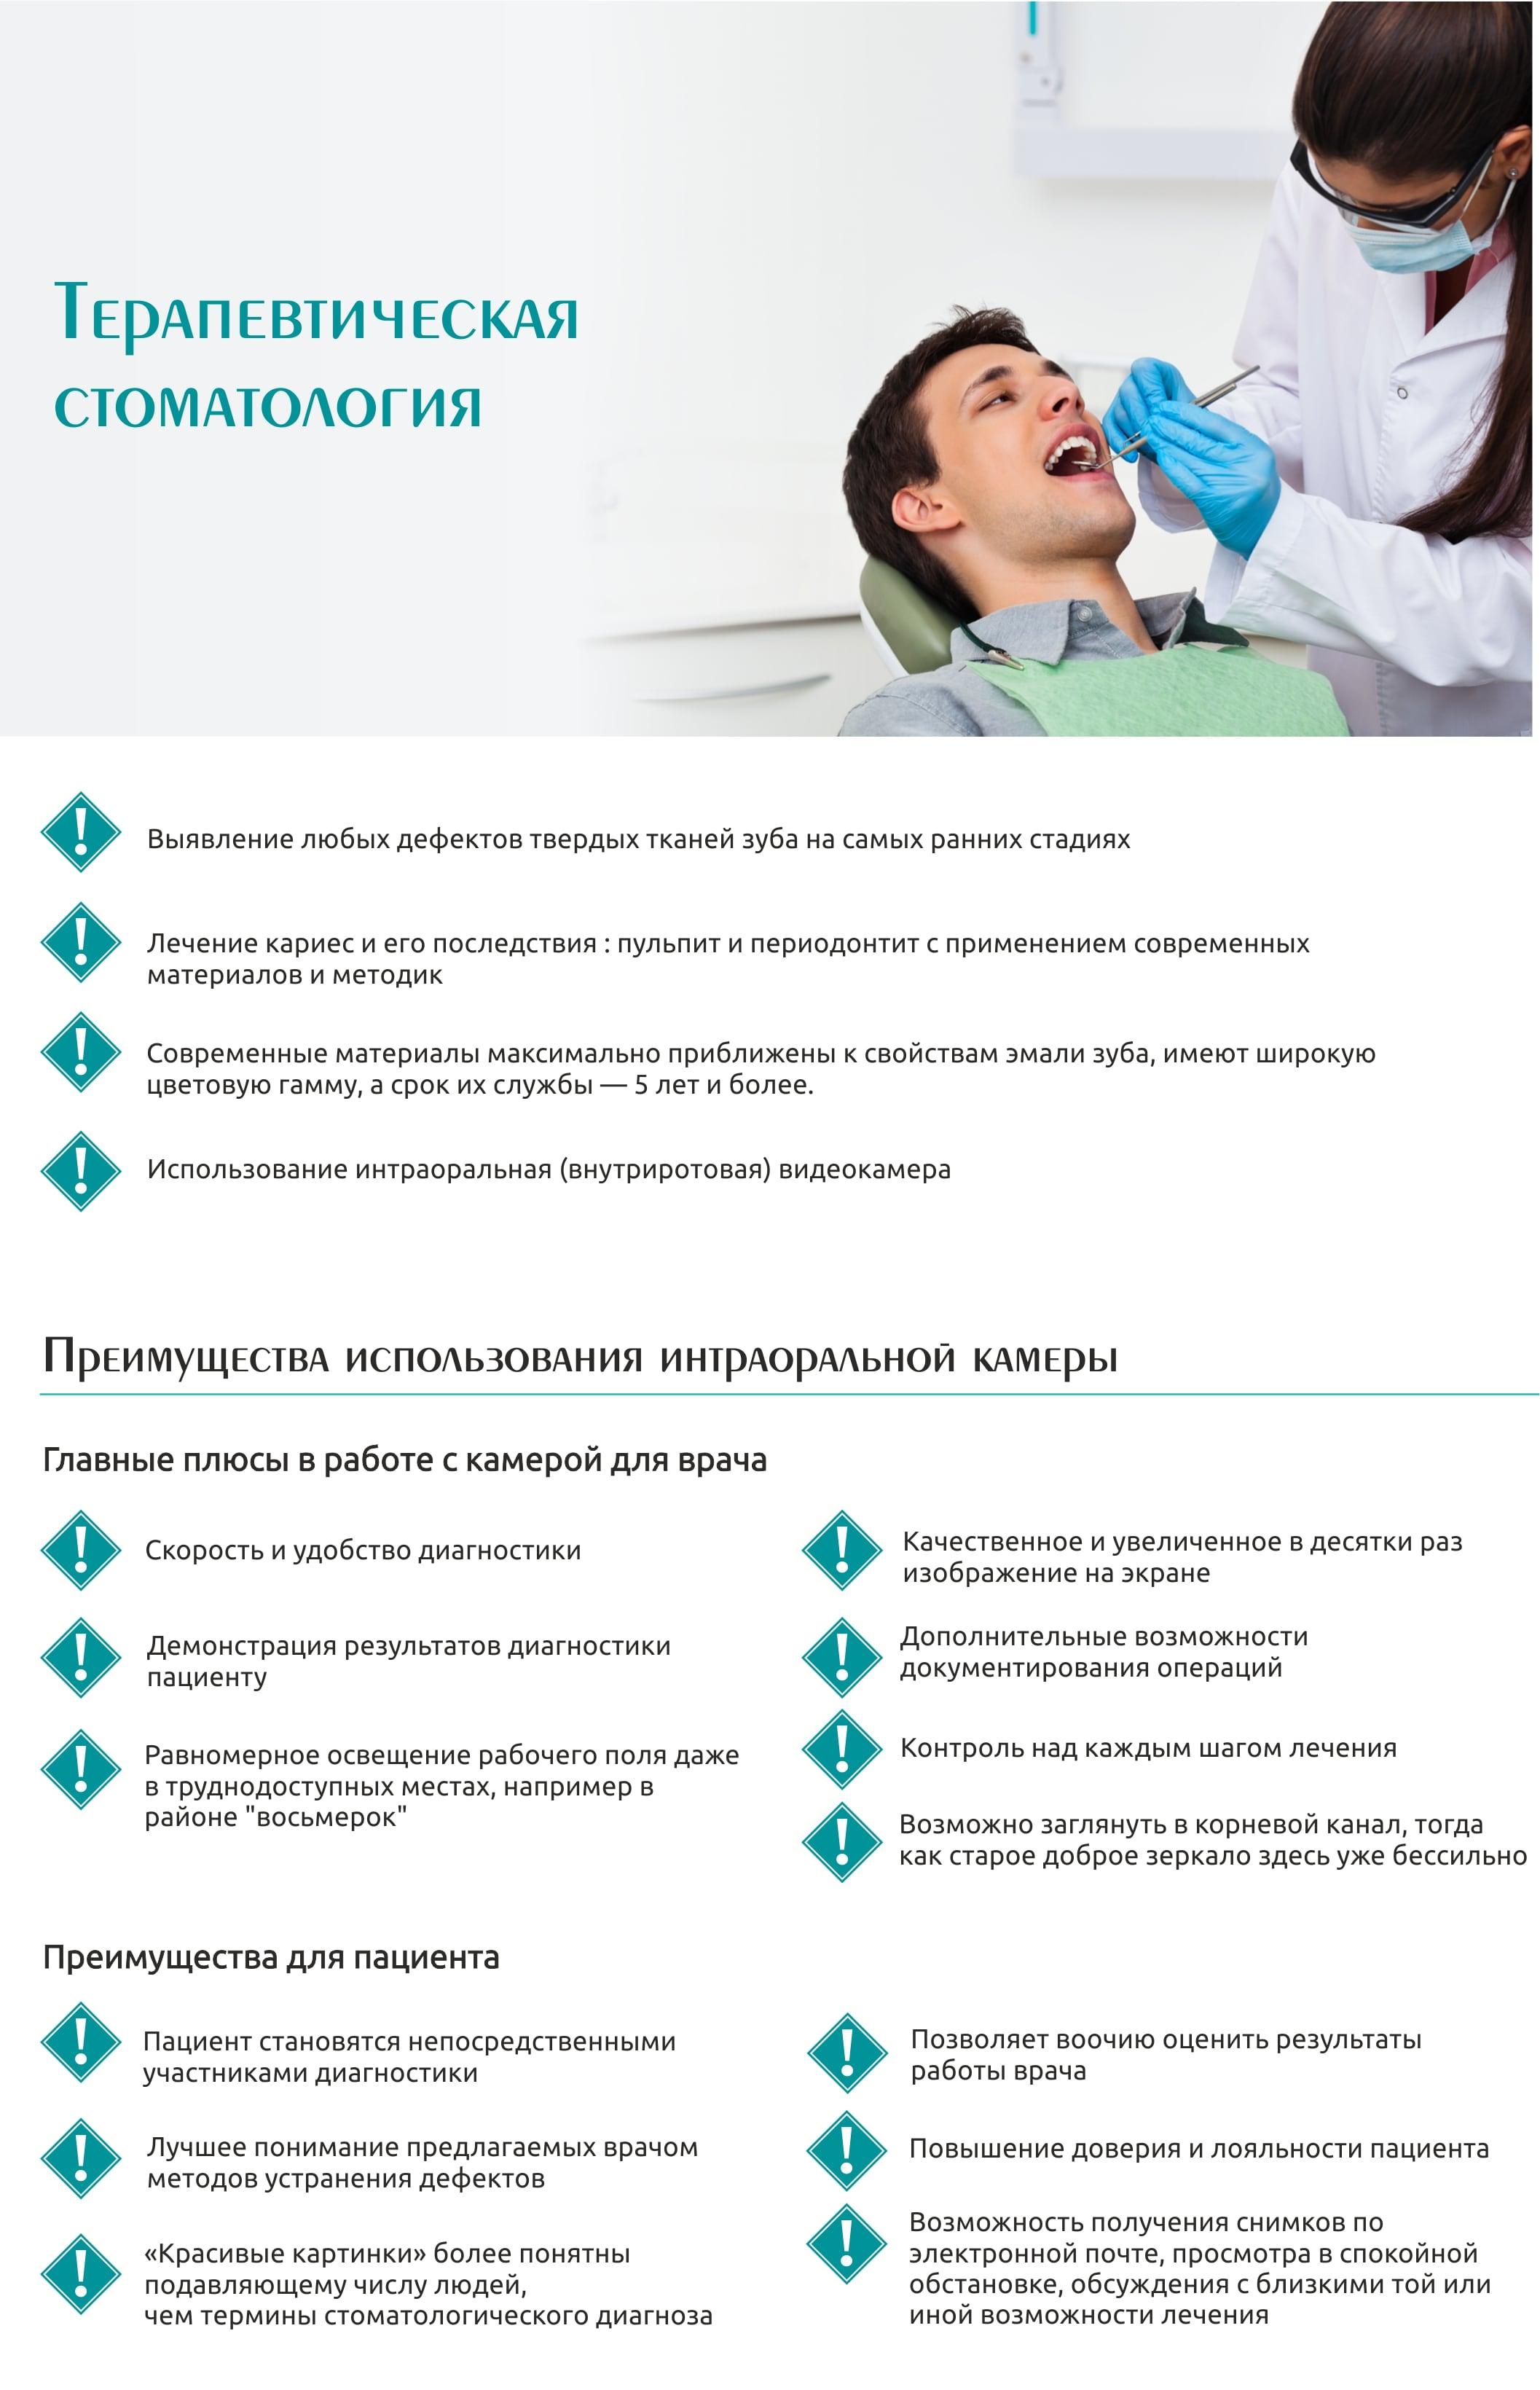 терапевт- стоматолог